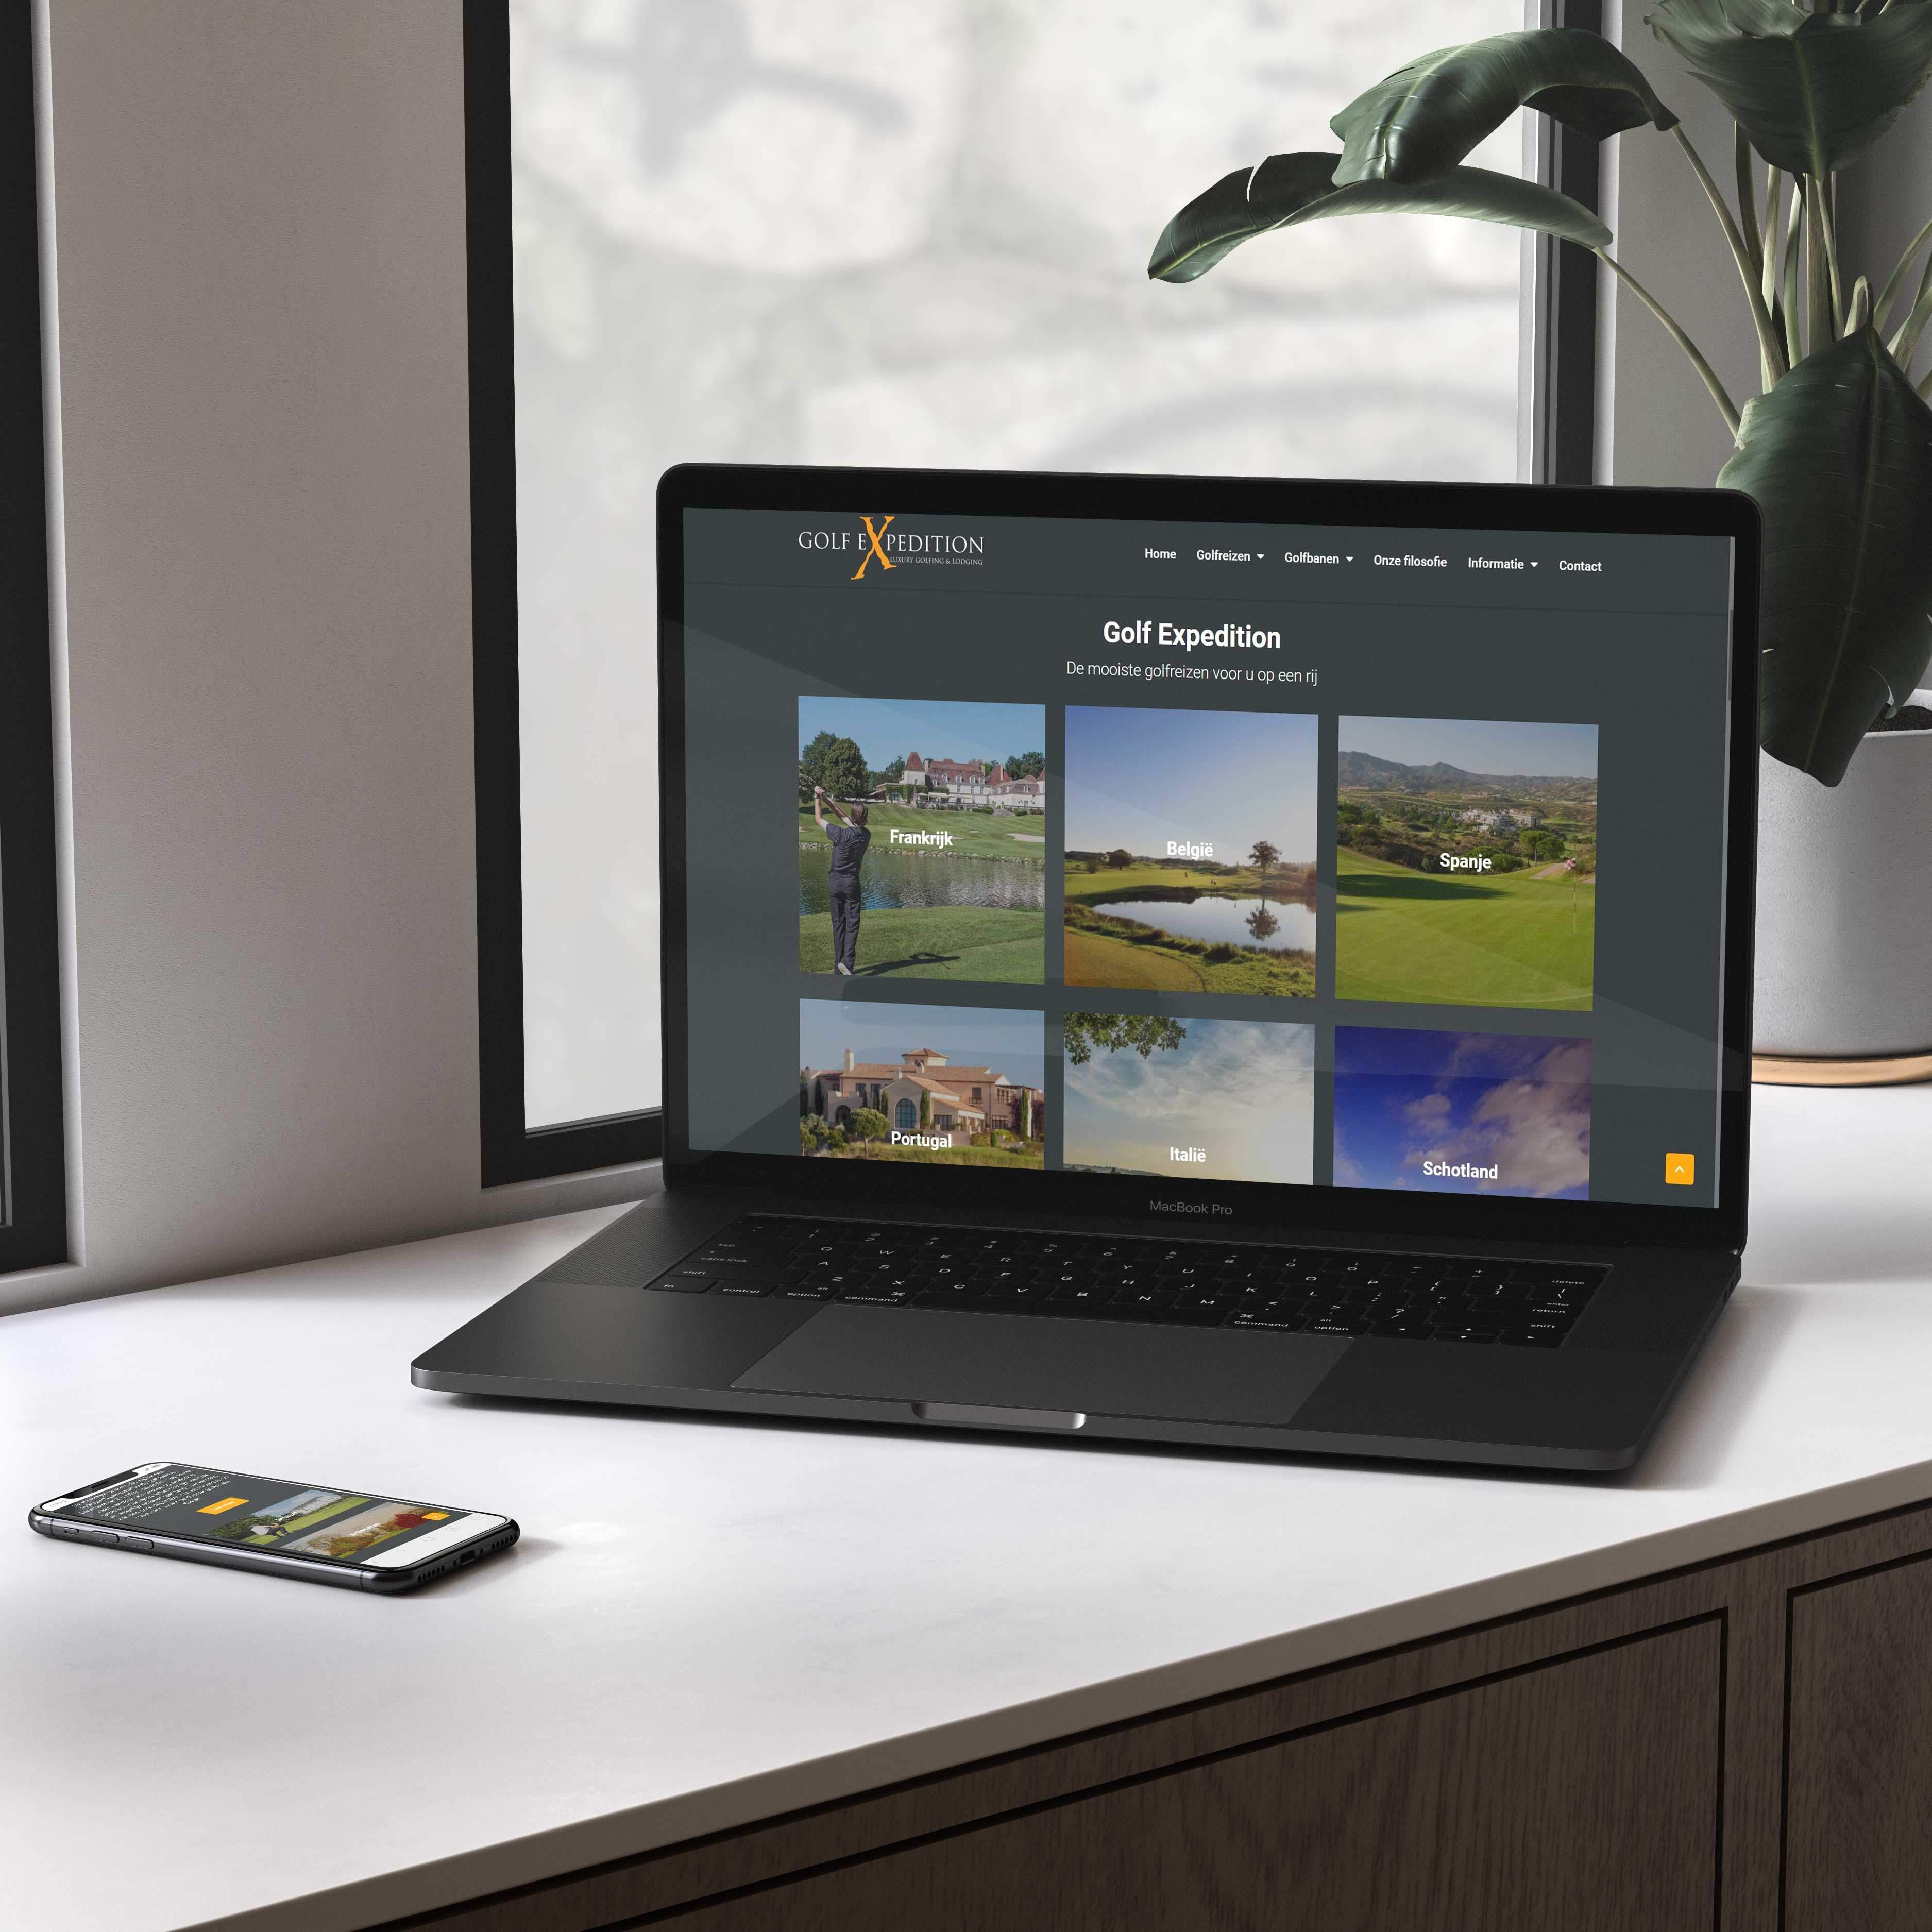 golf-expedition-online-marketing-bureau-webdevelopment-haarlem-made-marketing-2